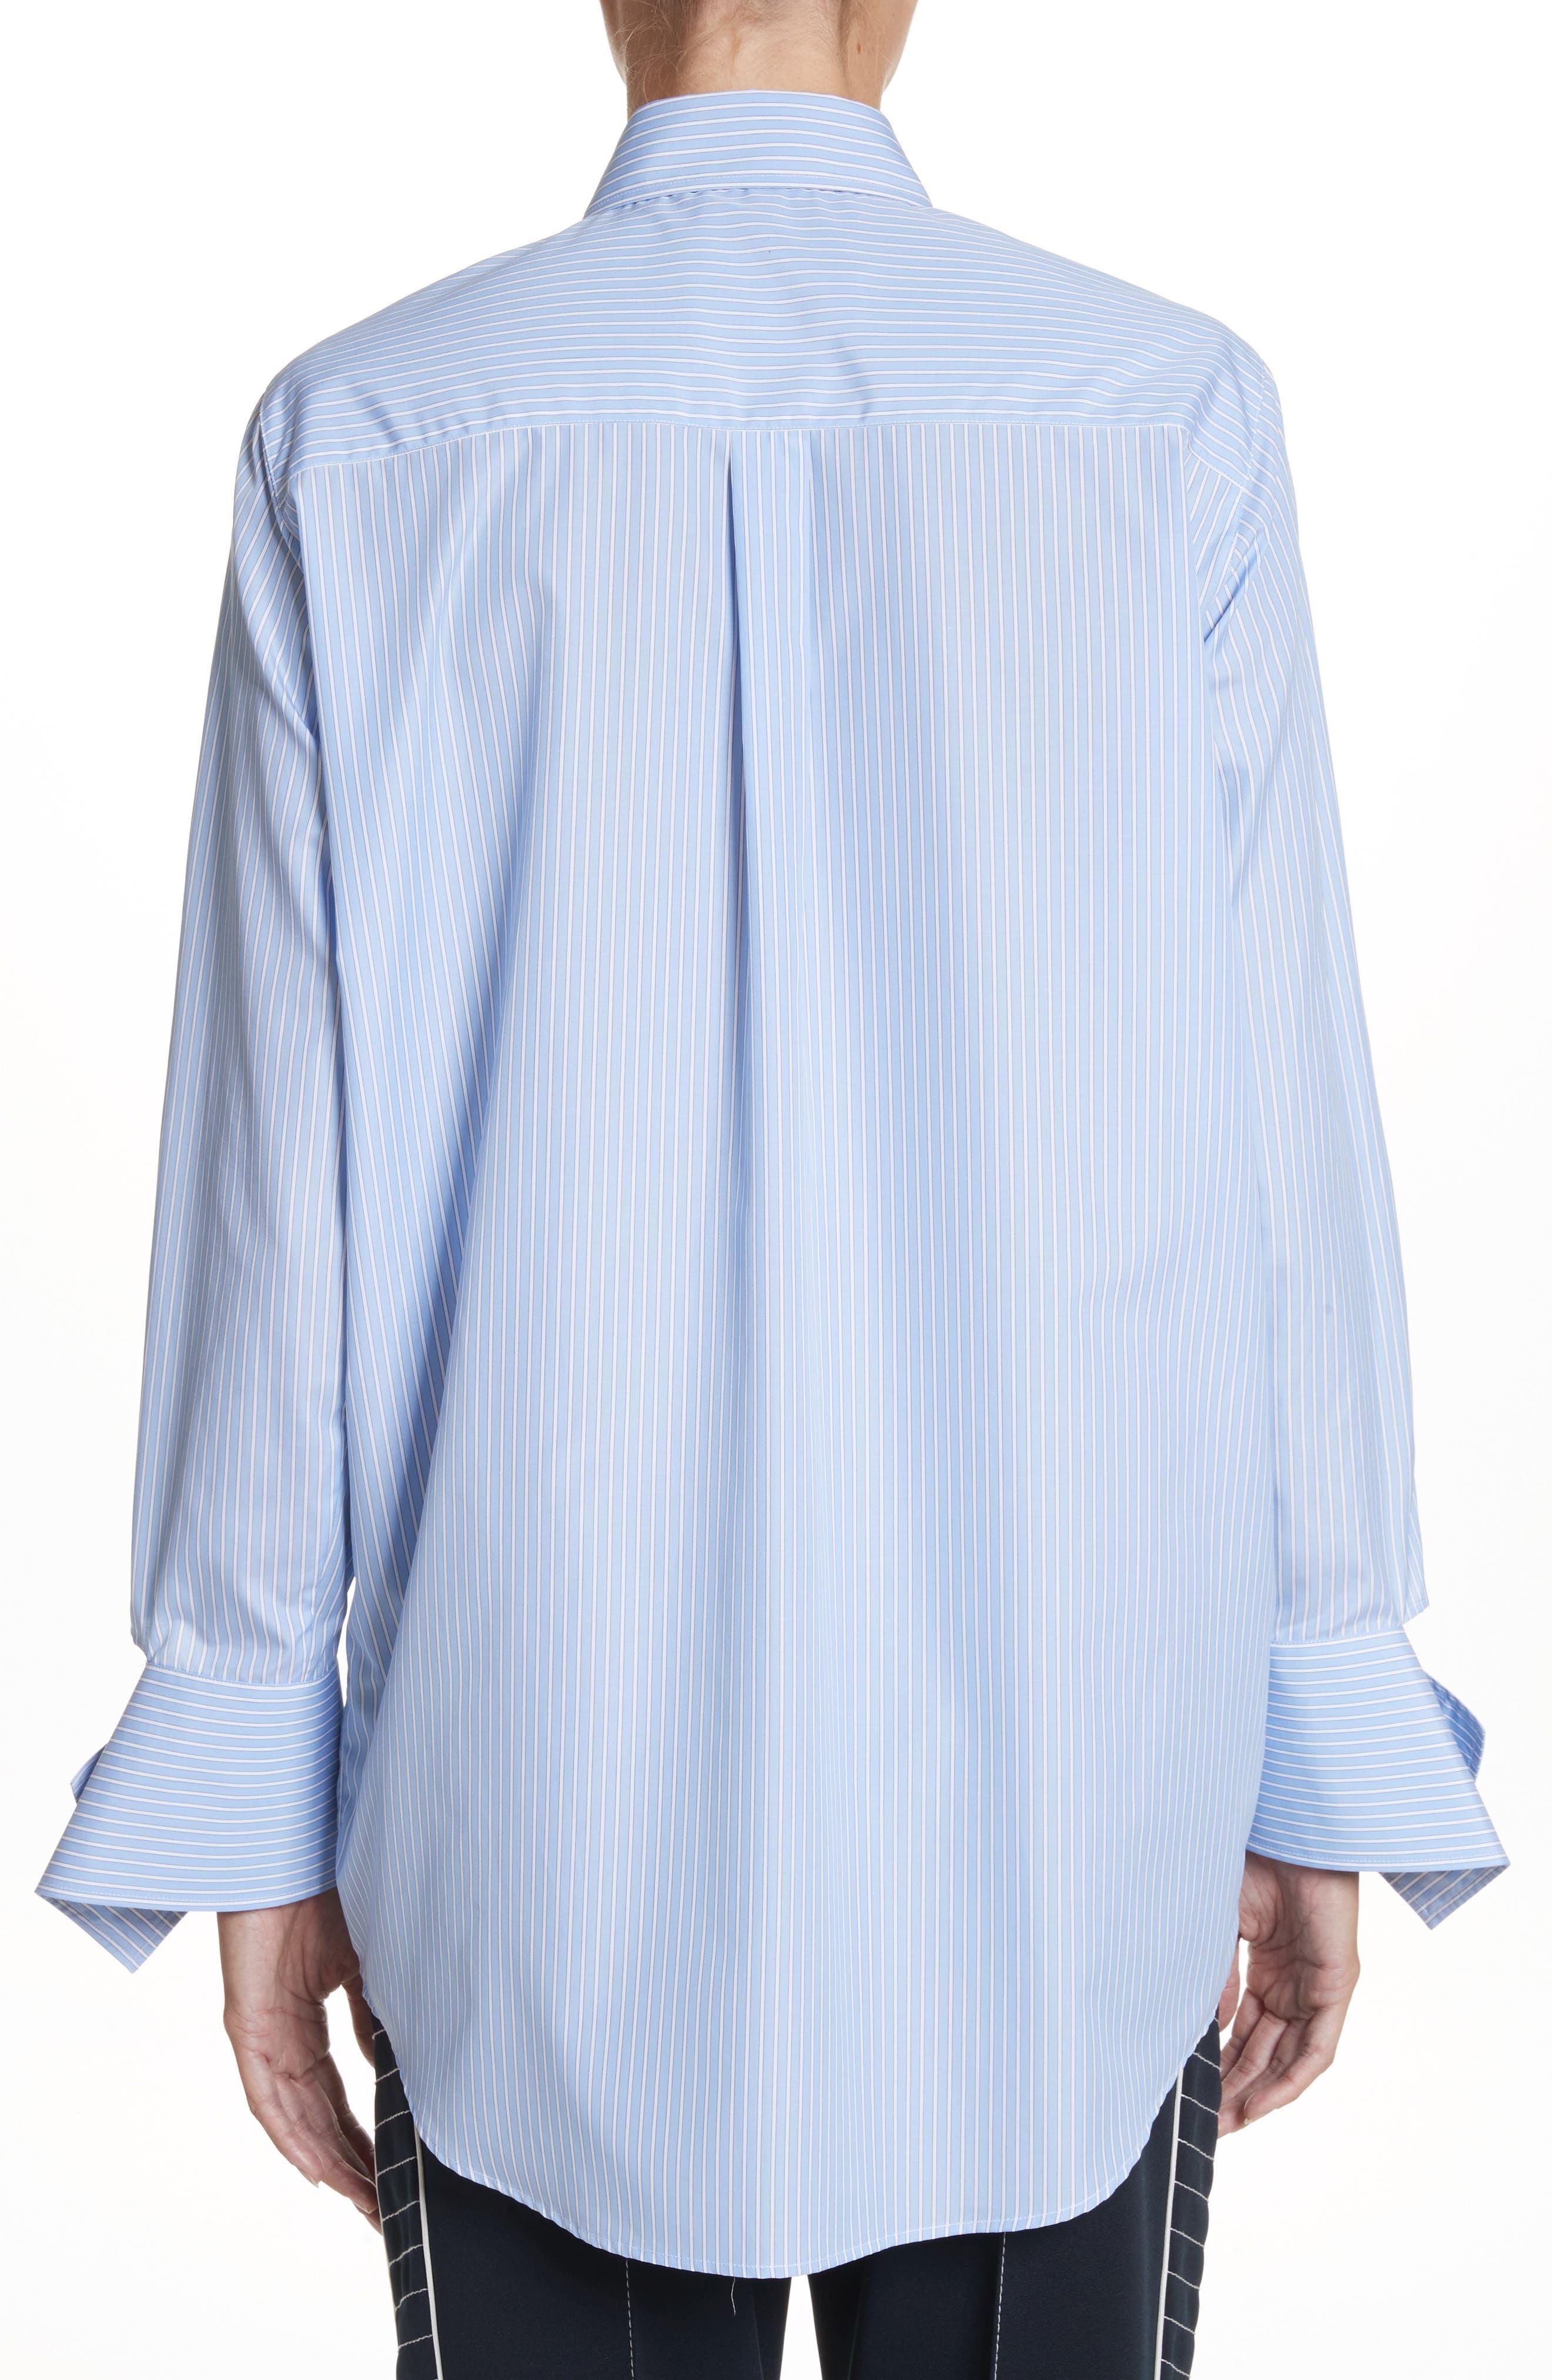 Cutaway Sleeve Cotton Poplin Shirt,                             Alternate thumbnail 2, color,                             Blue / White